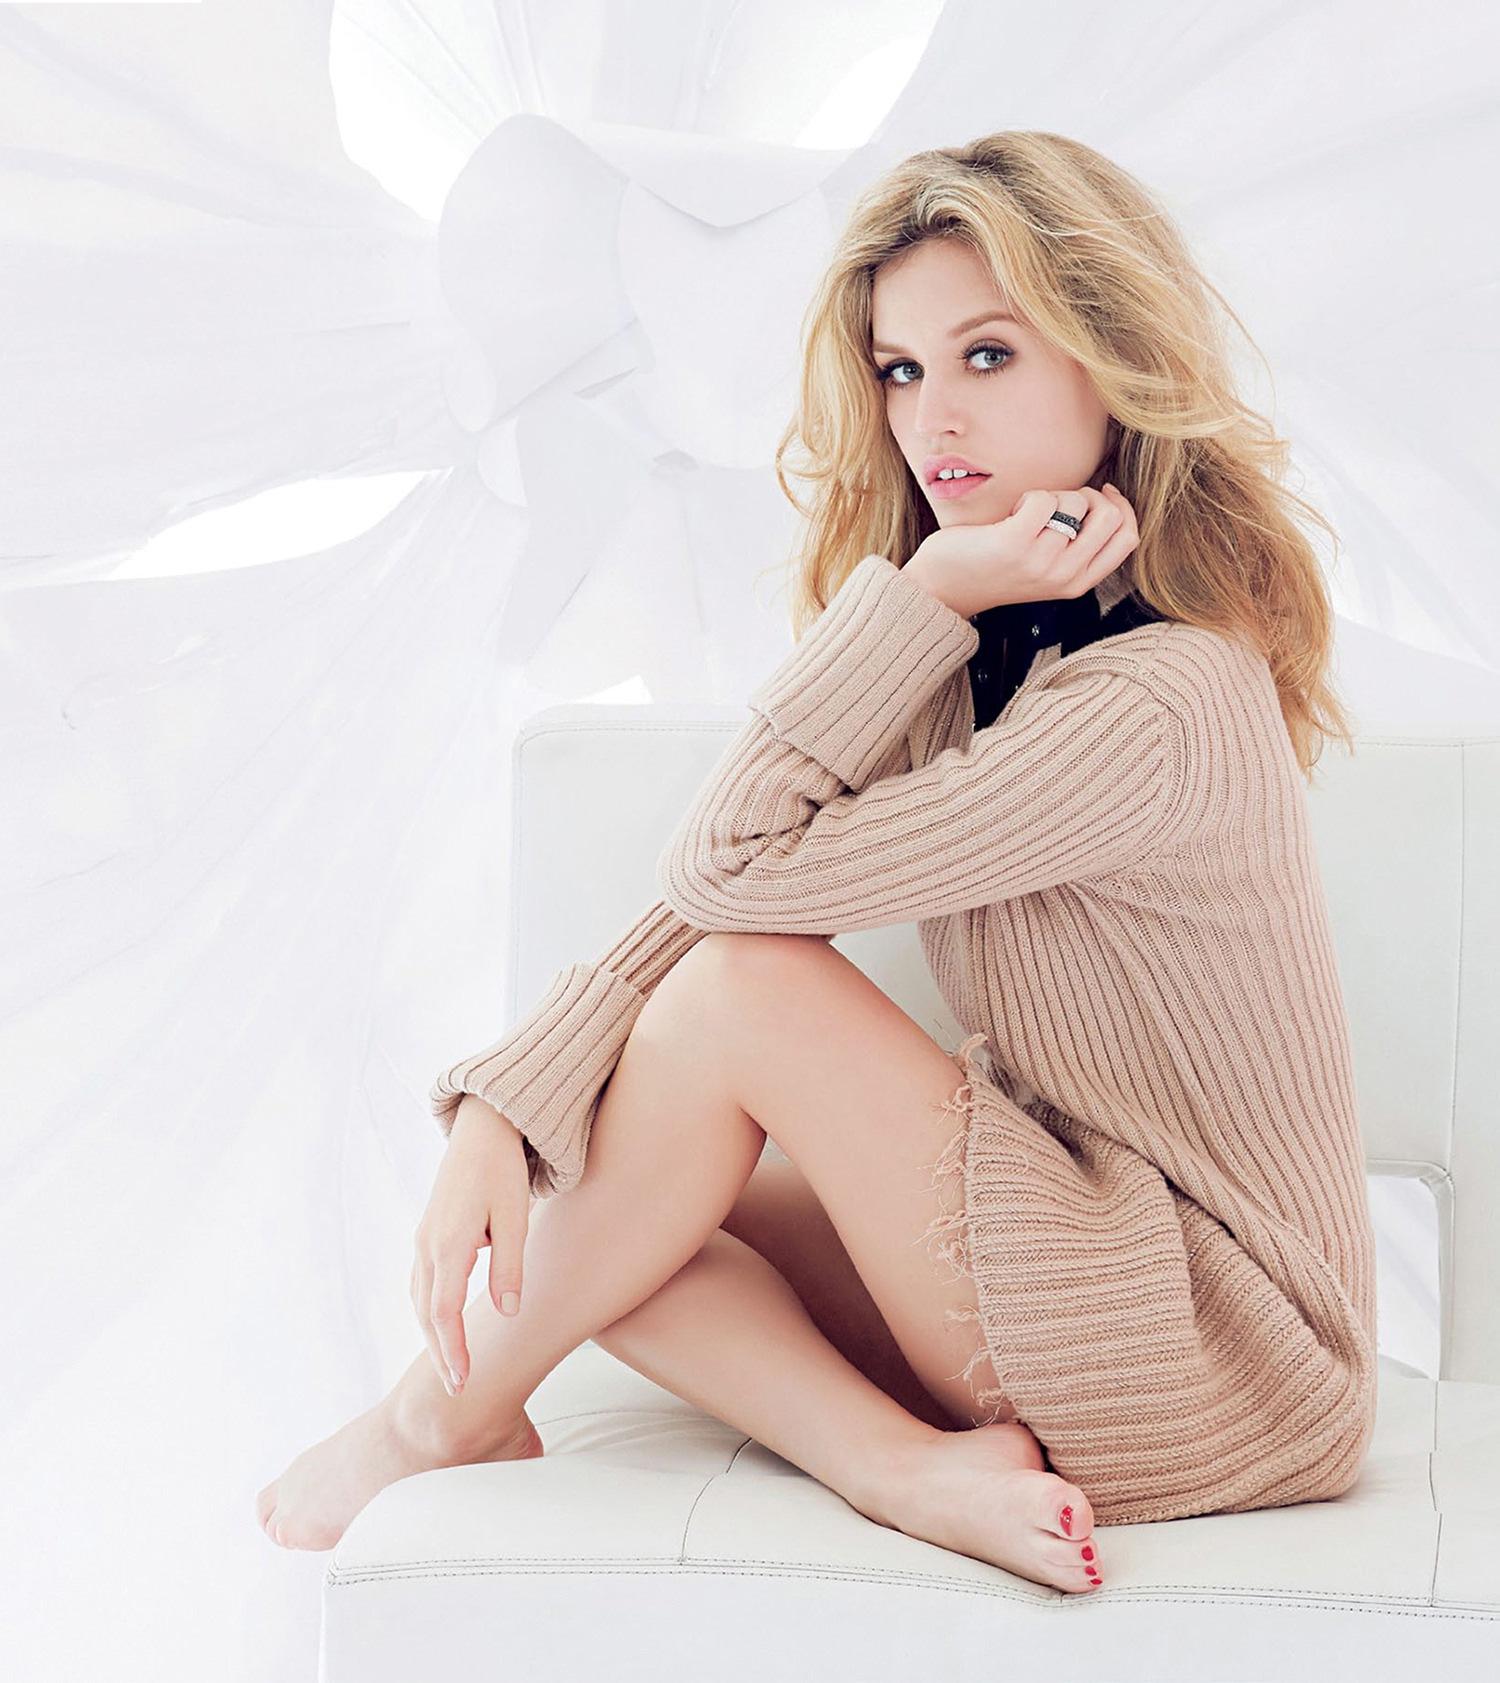 Celebrity Caroline Trentini naked (84 photo), Tits, Paparazzi, Selfie, panties 2015